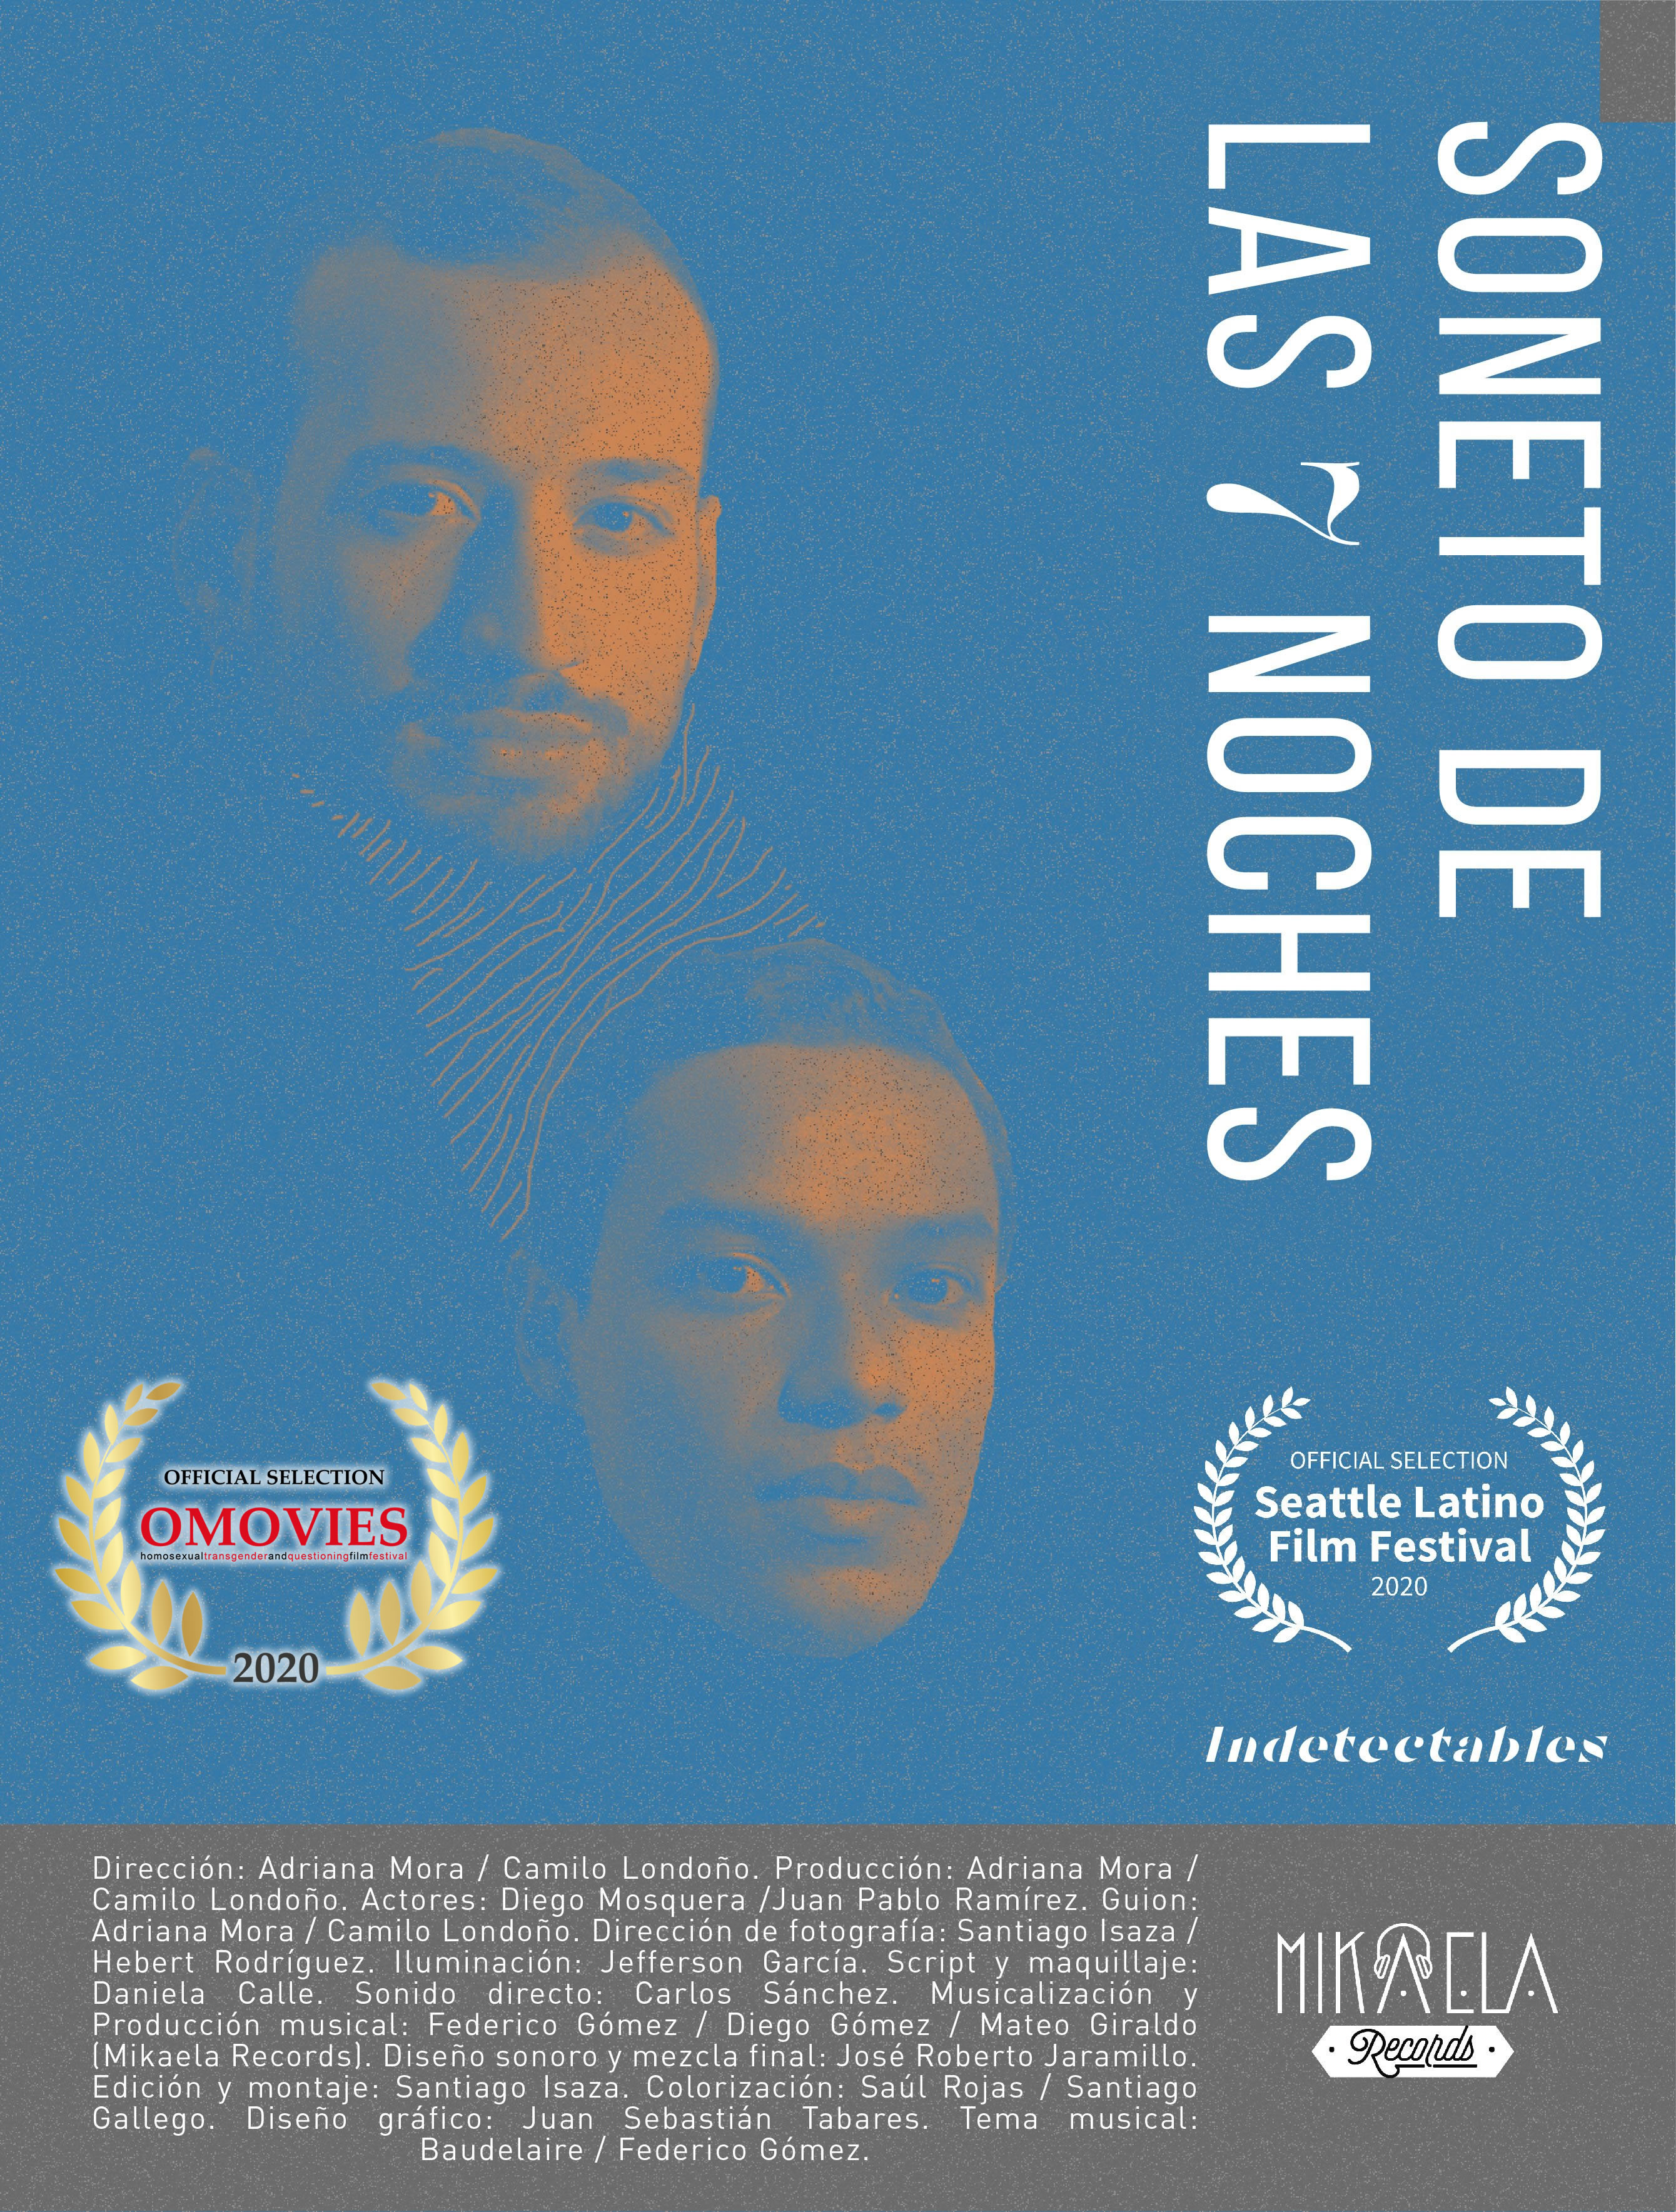 Soneto de las 7 noches – DirectorAdriana Mora e Camilo Londoño 21 DEC